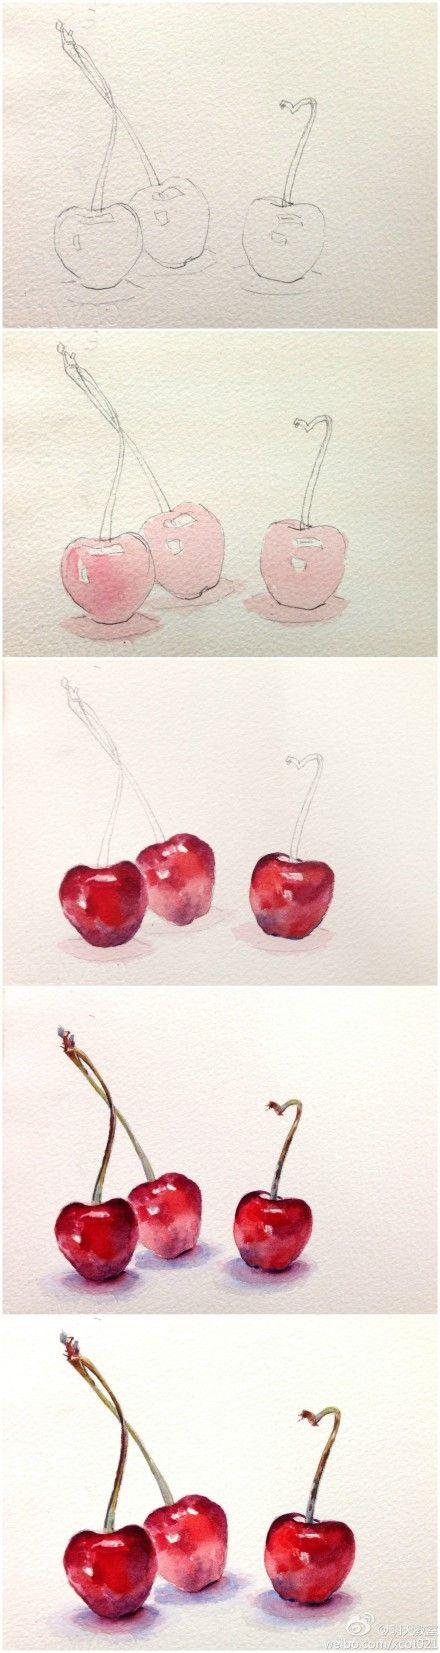 Duitang.com - 【绘画教程】蔬果类示范汇总,by 。老师示范的这么好,想知道同学们画的怎么样吗?先去吃水果解眼馋,下周公布 樱桃画法